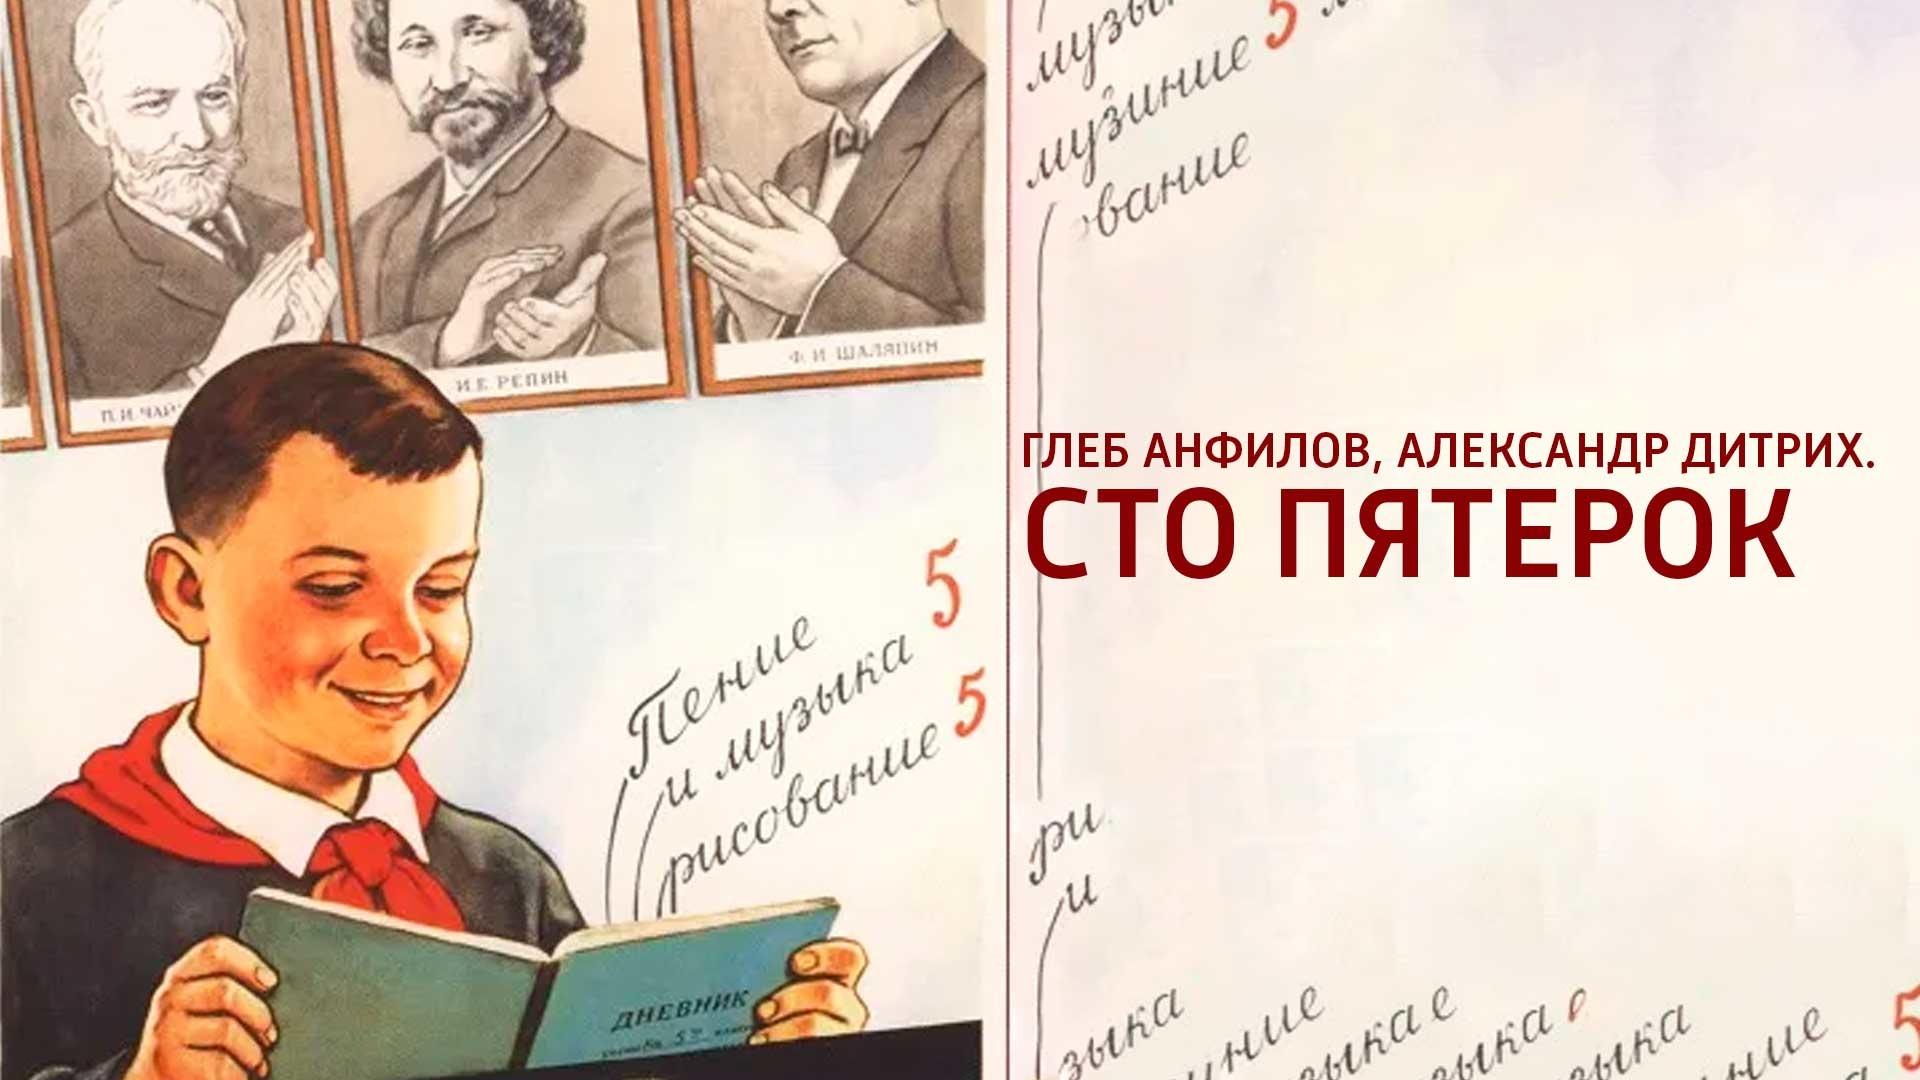 Глеб Анфилов, Александр Дитрих. Сто пятерок